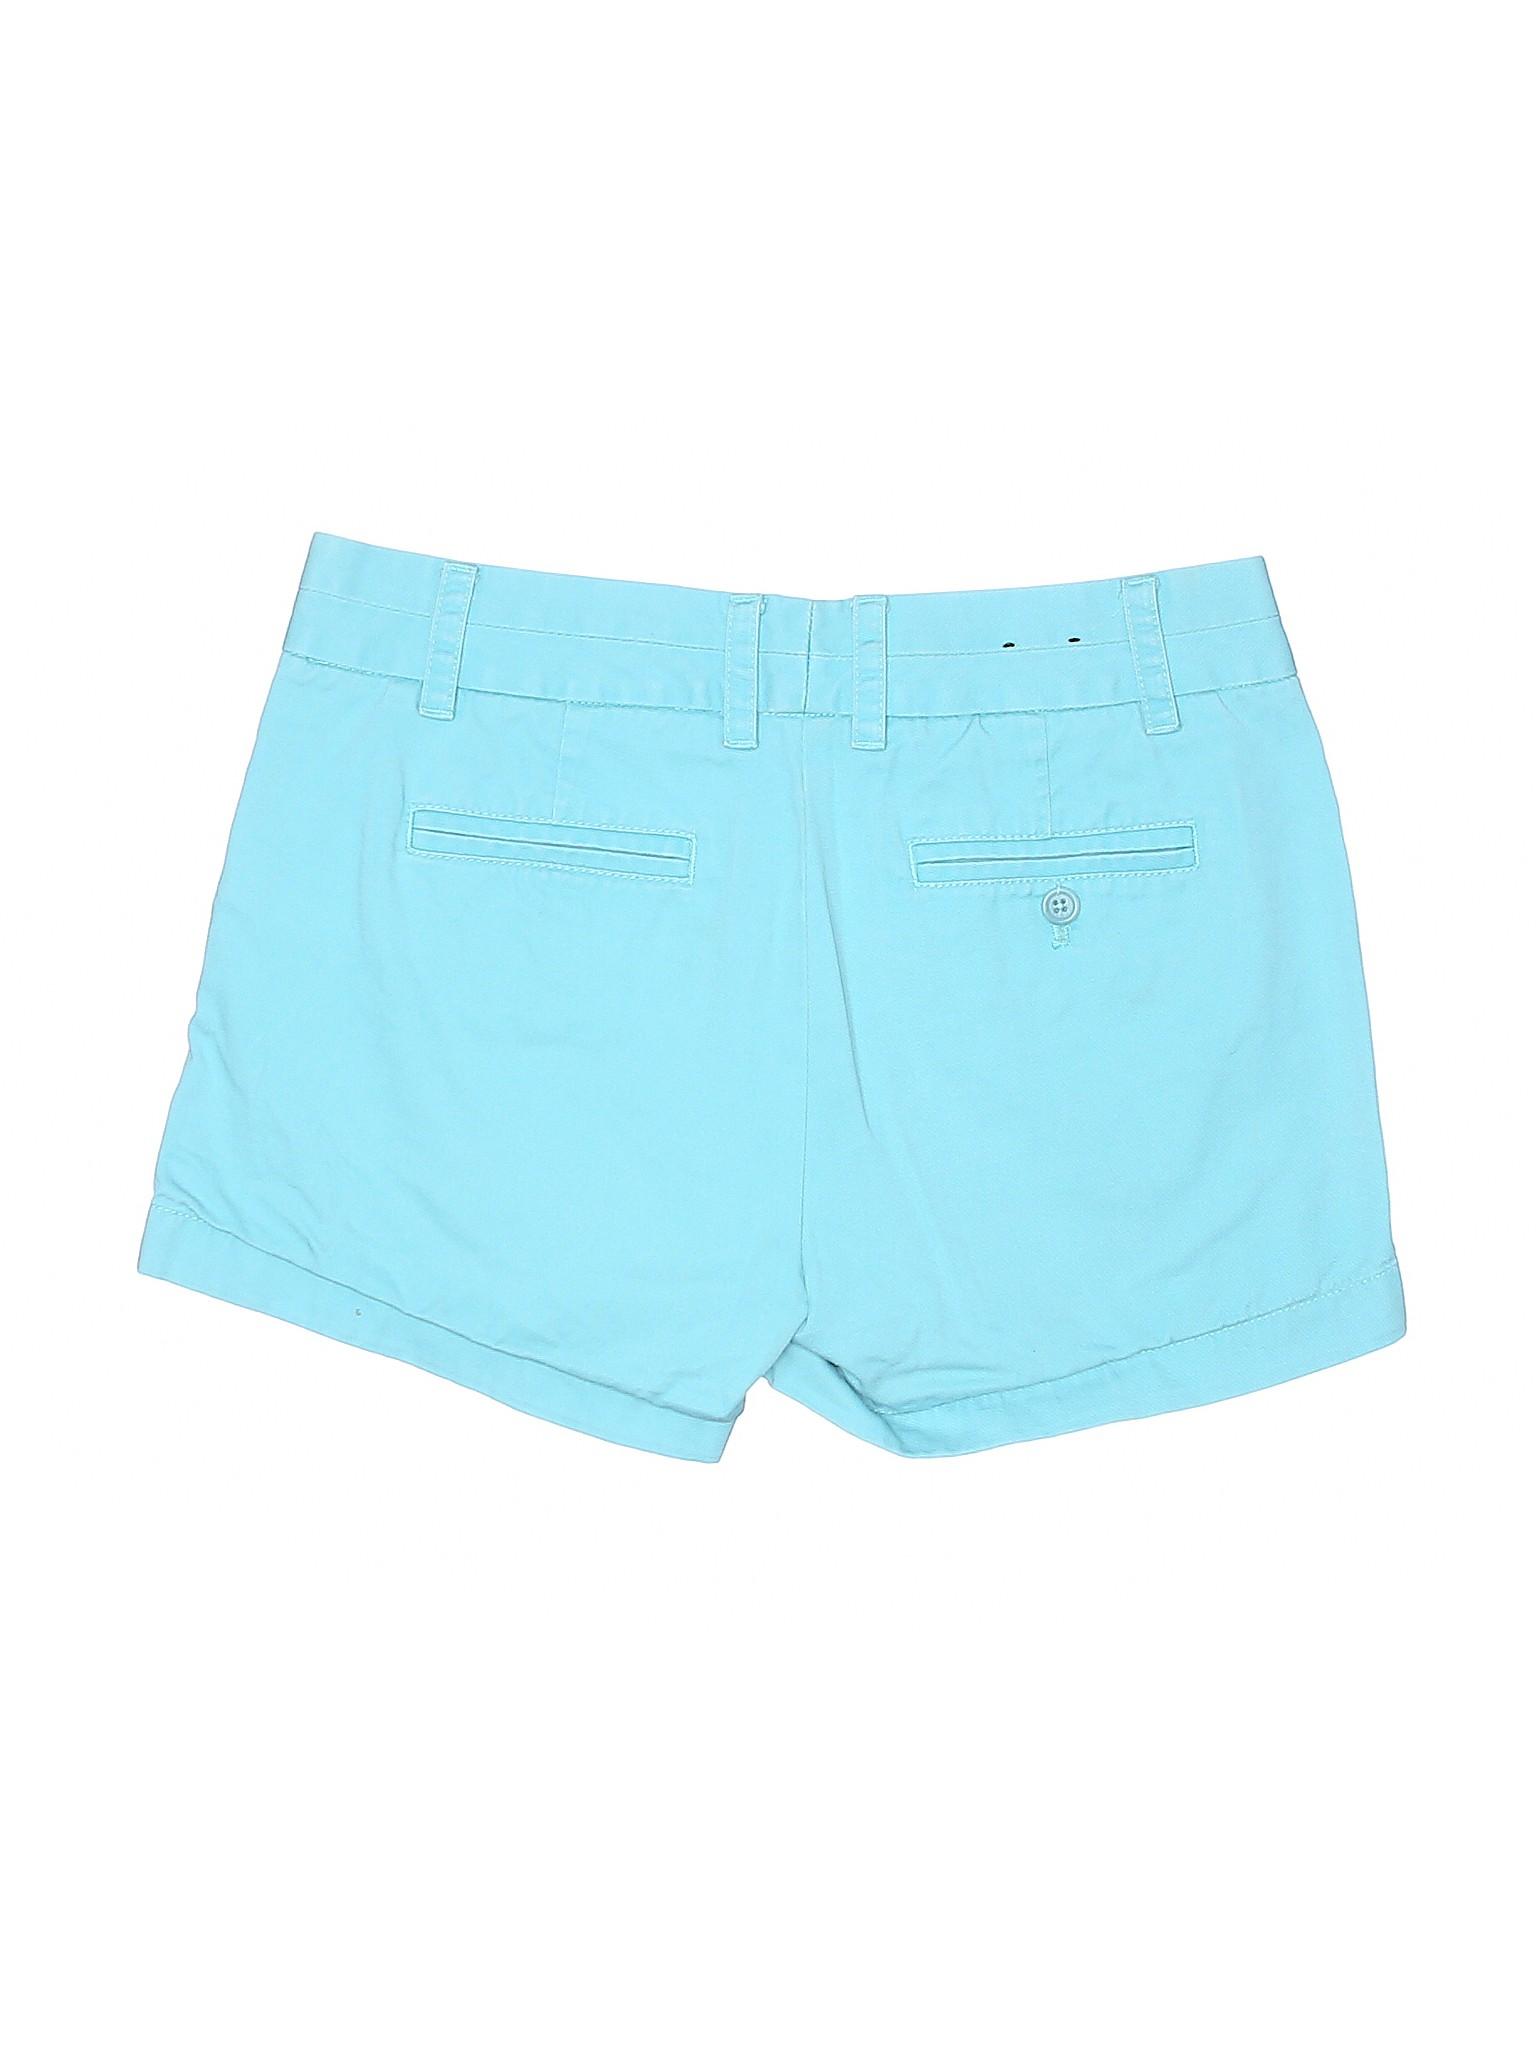 Boutique Boutique Crew Khaki Crew J Shorts J Khaki n7Z7gtw1